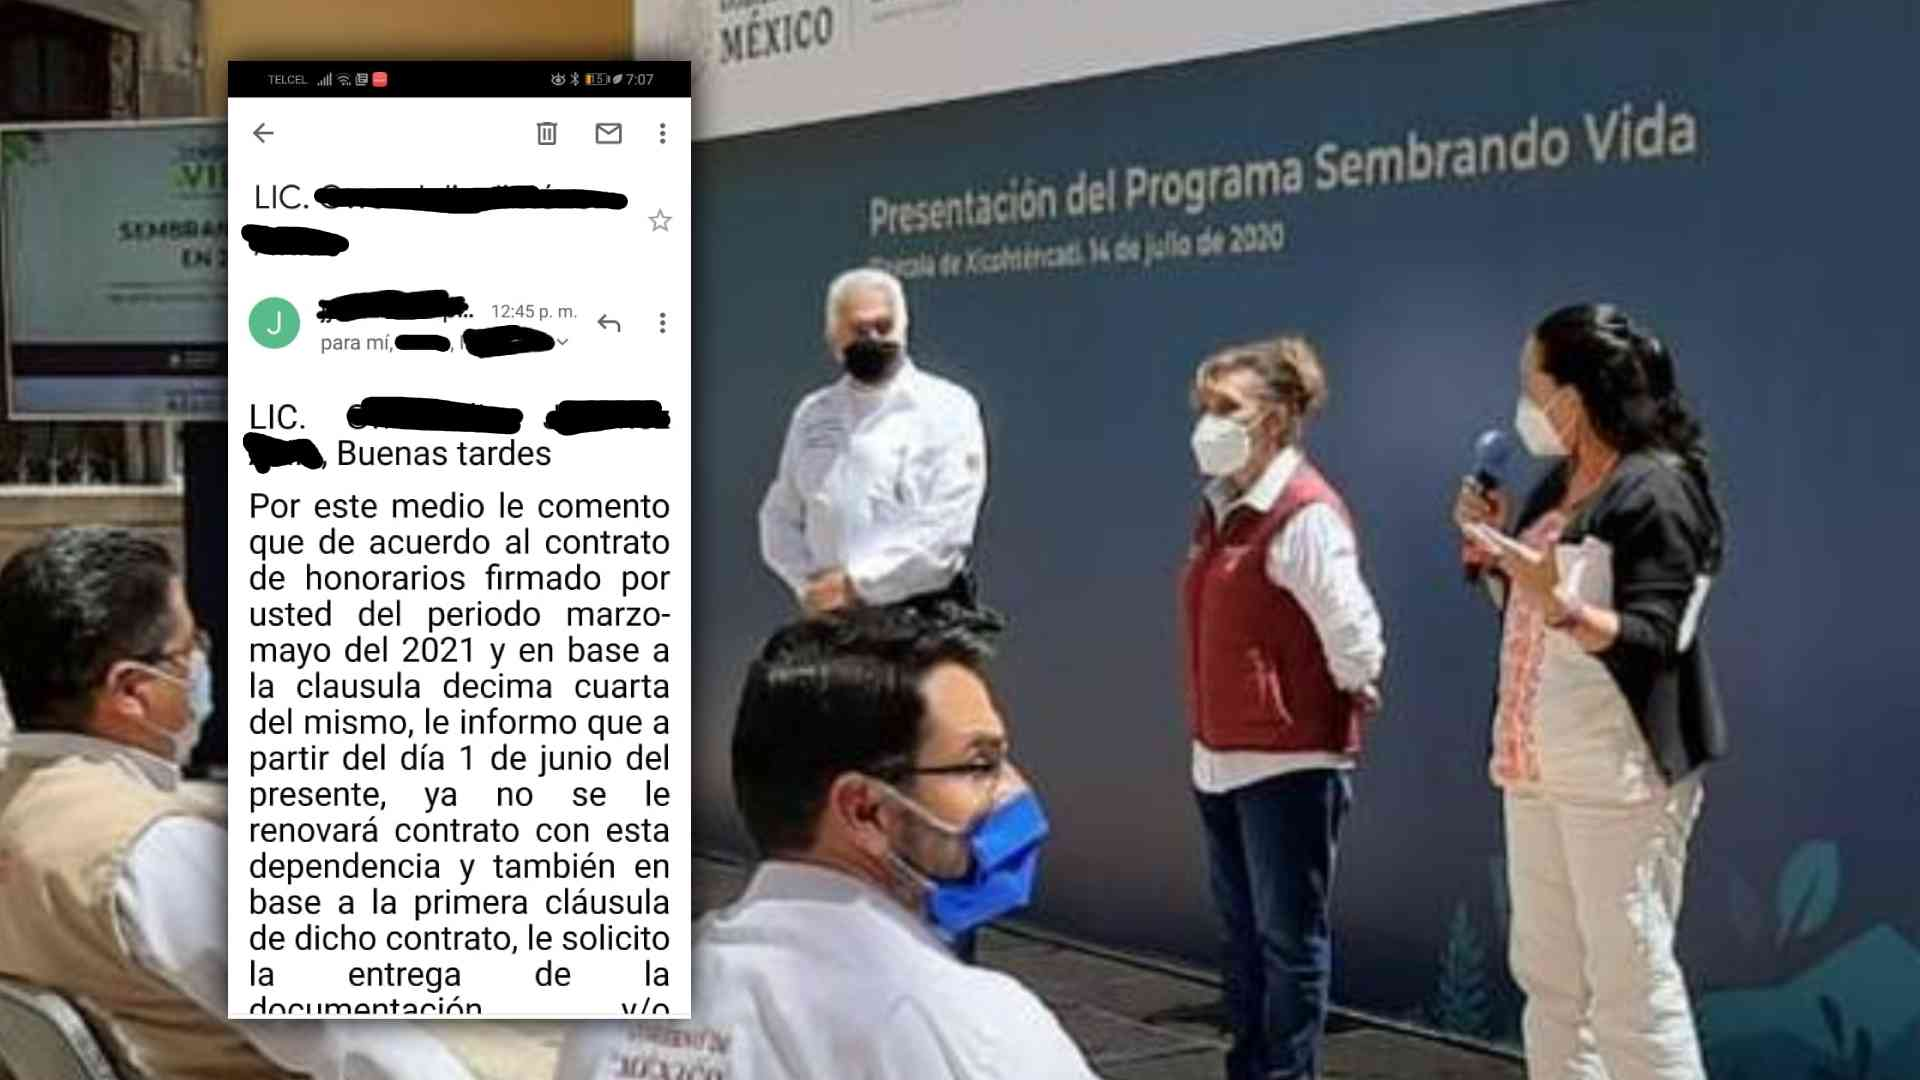 Lorena Cuéllar-programa Sembrando vida-Elecciones 2021